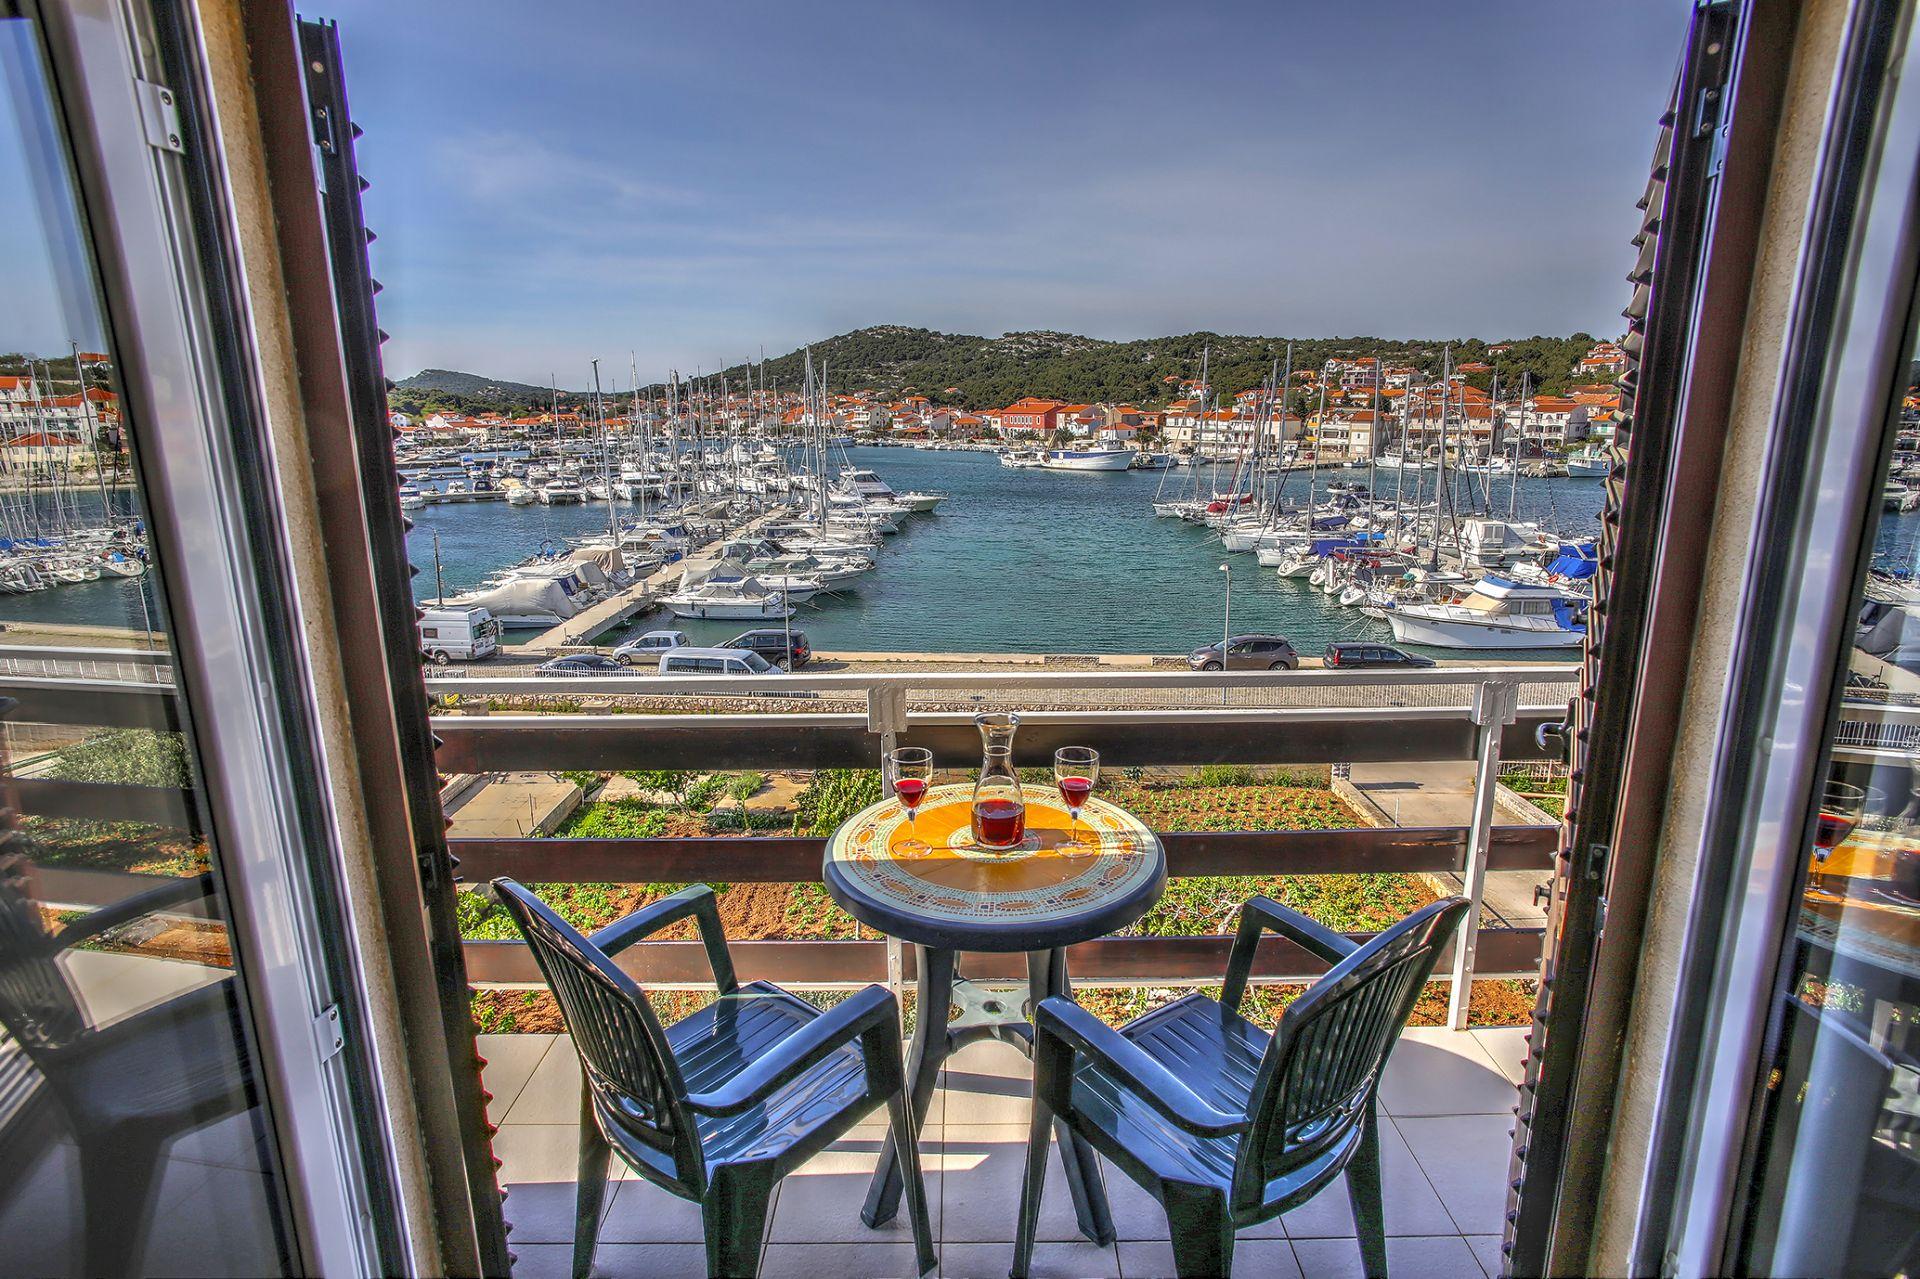 5409 - Jezera - Apartments Croatia - A1(2+1): terrace